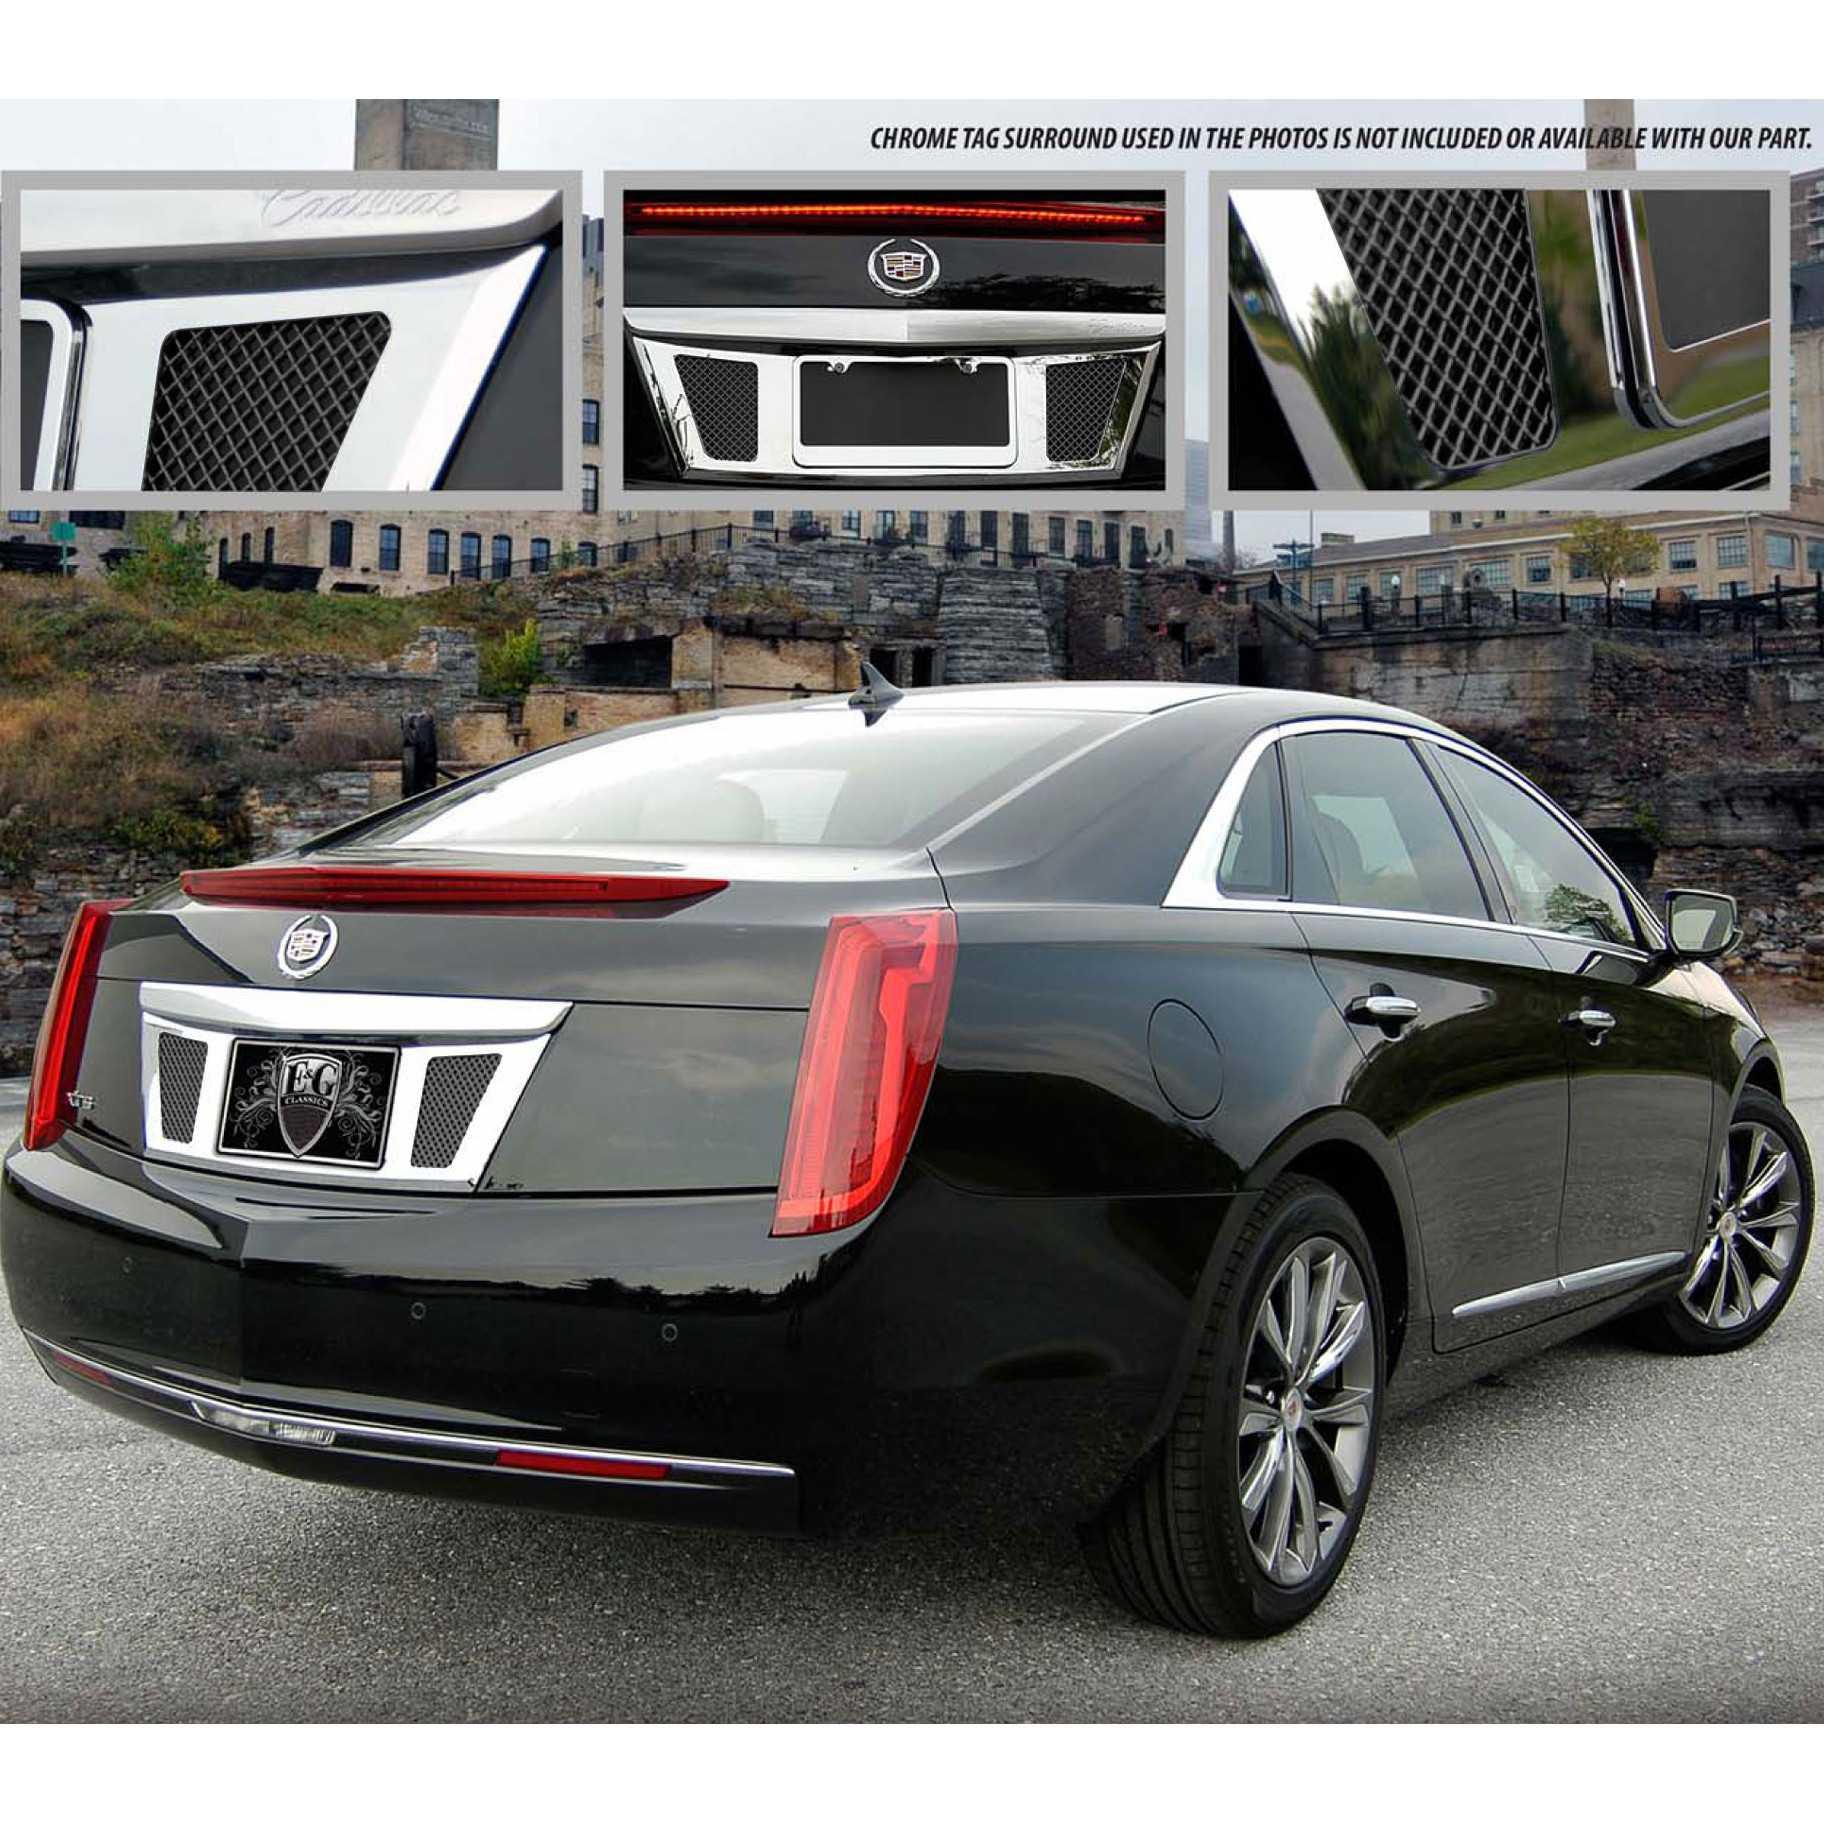 Cadillac 2013 Price: E&G Classics 2013-2016 Cadillac XTS Accessories Classic Rear Tag Surround Black Ice Mesh